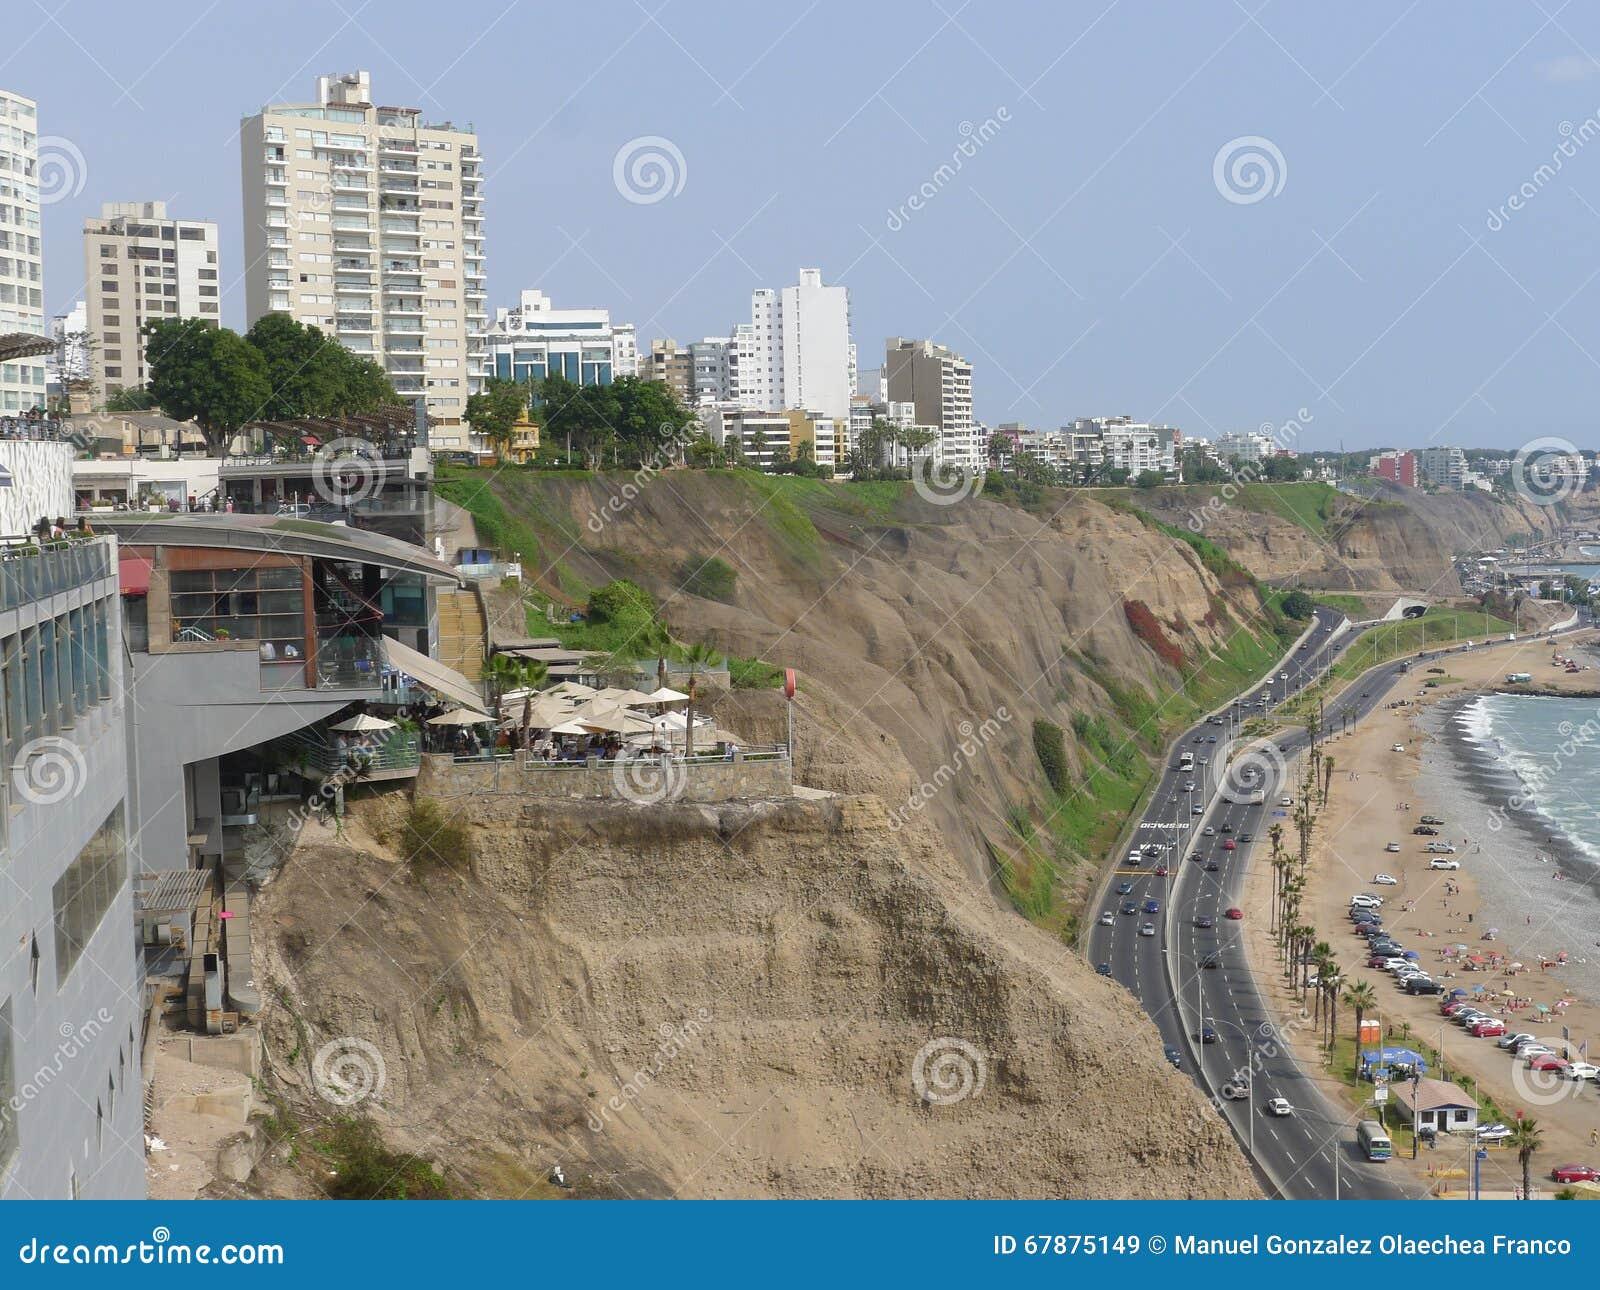 Costa Verde Green Coast In Miraflores Editorial Photo